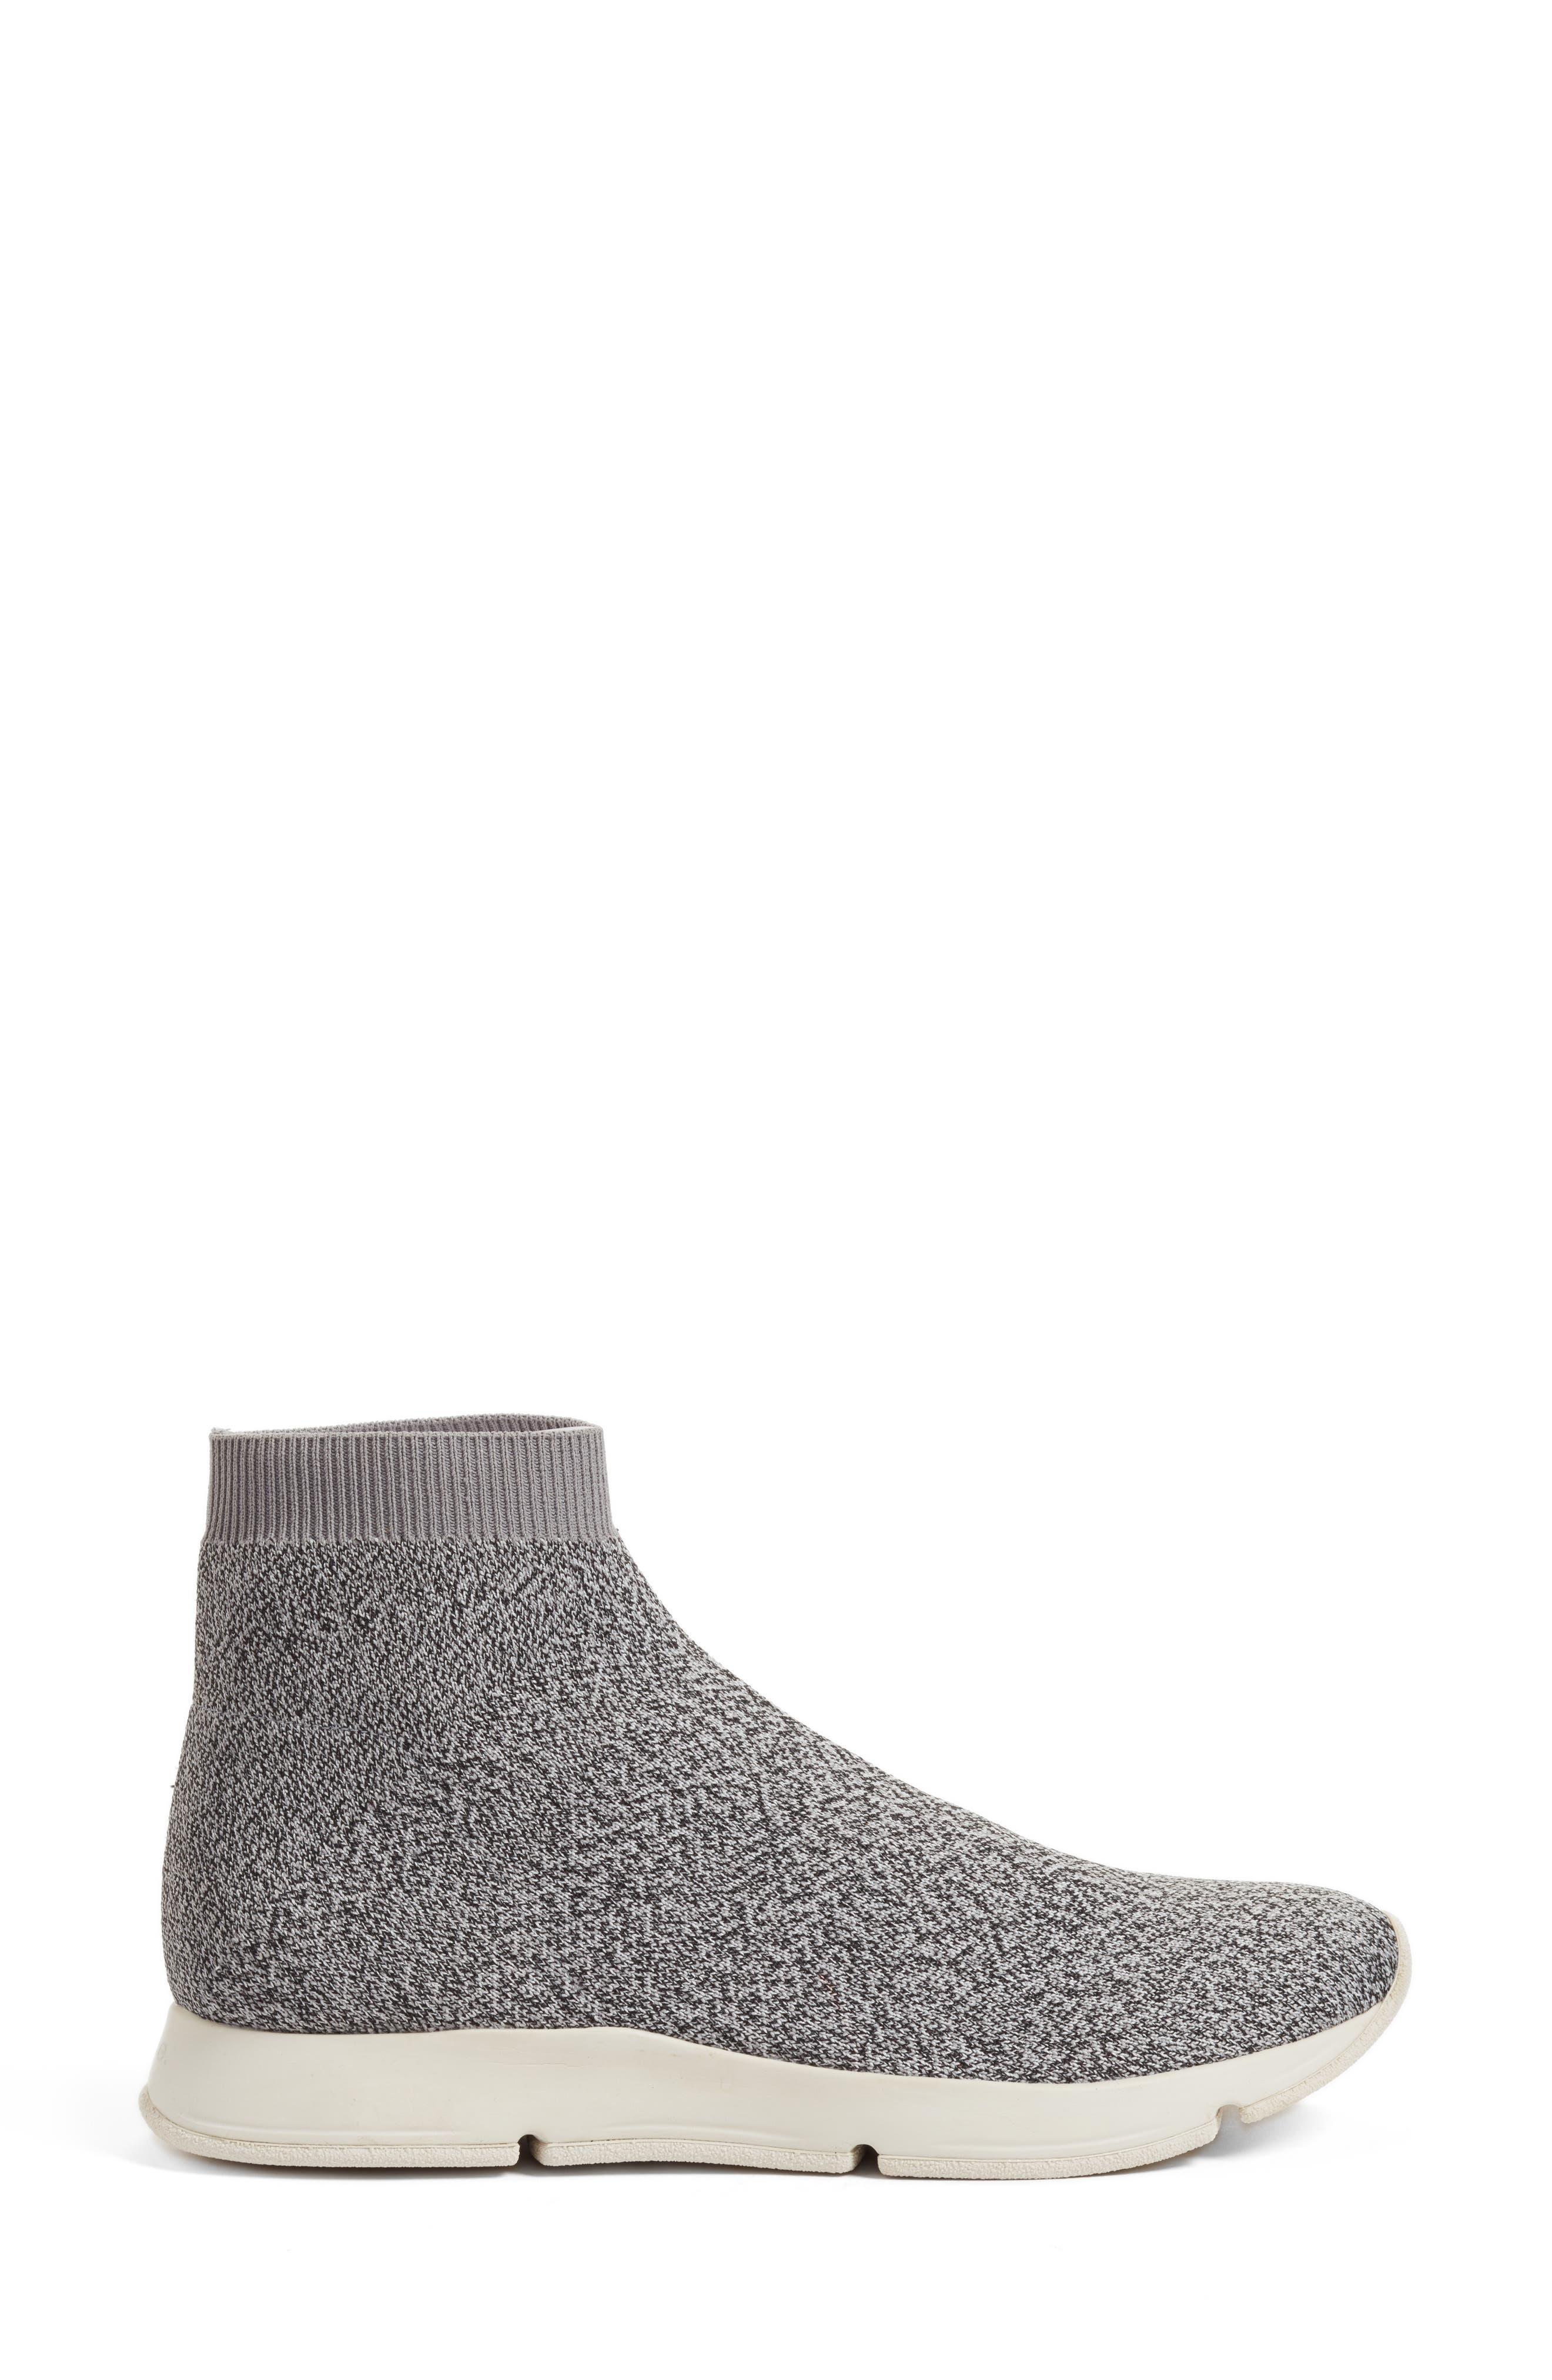 Tyra Sock Sneaker,                             Alternate thumbnail 3, color,                             Grey Marl